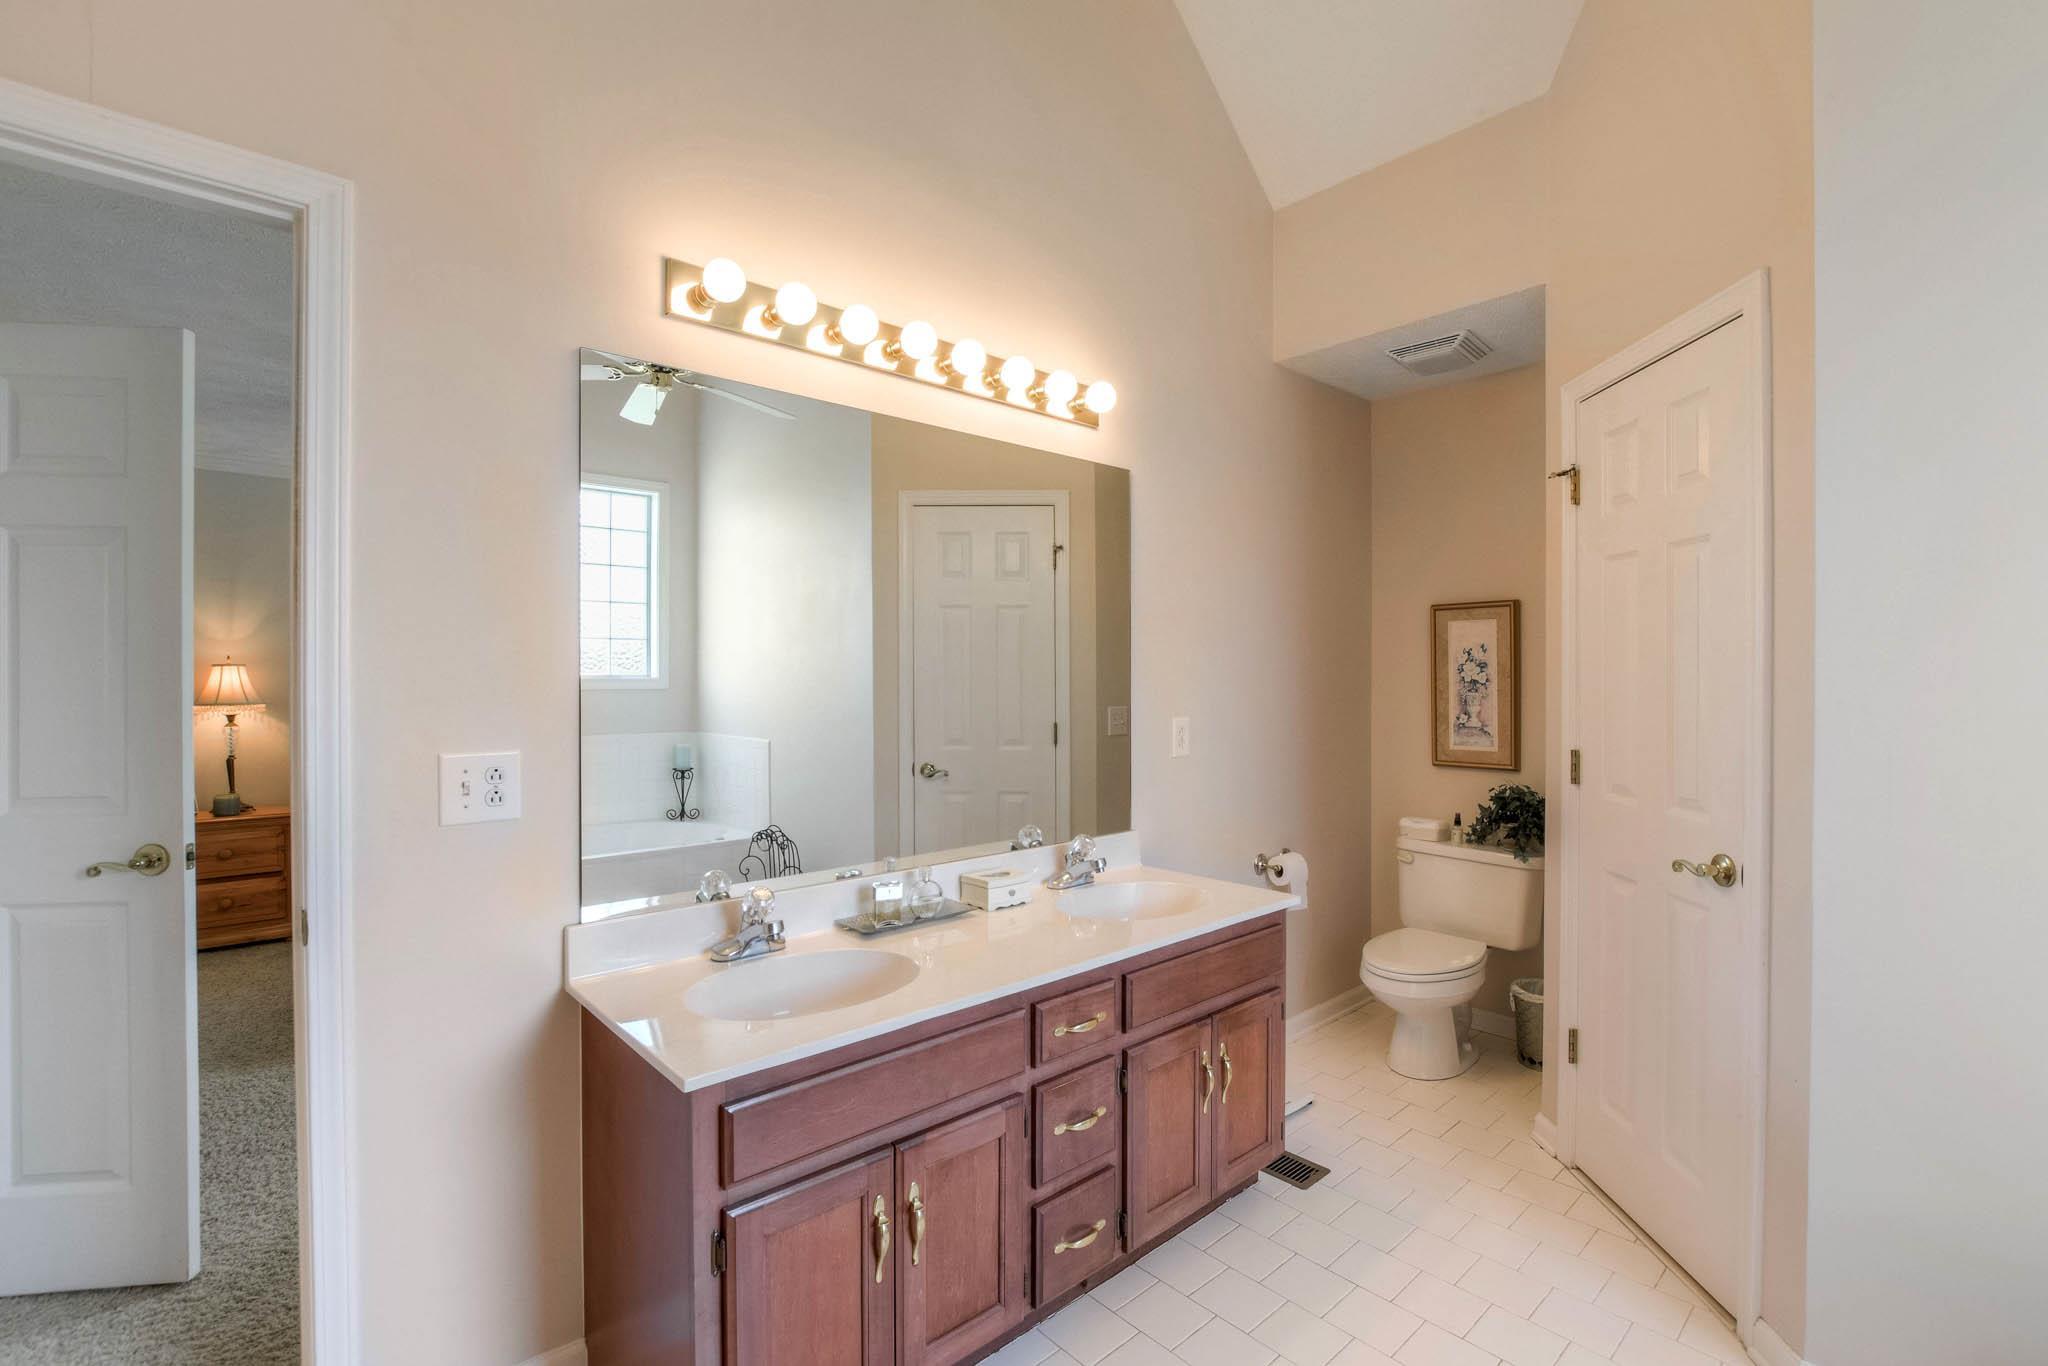 Acorn bathroom furniture - Acorn Bathroom Furniture 29